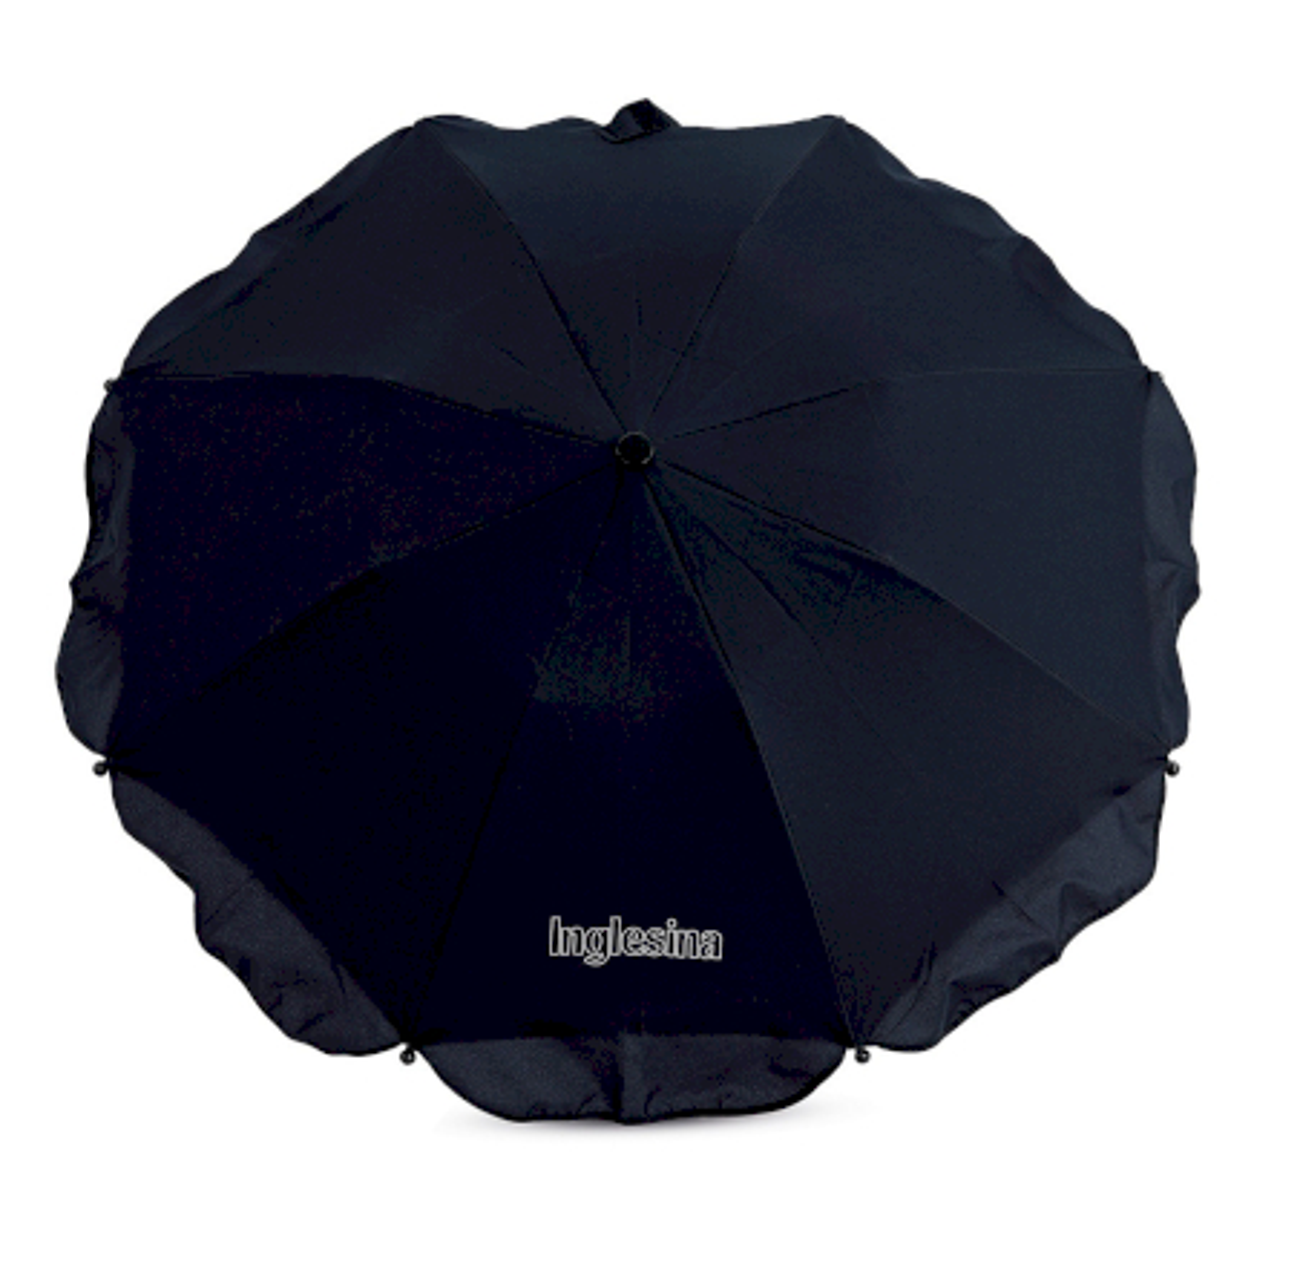 Inglesina Ombrelle Bleu